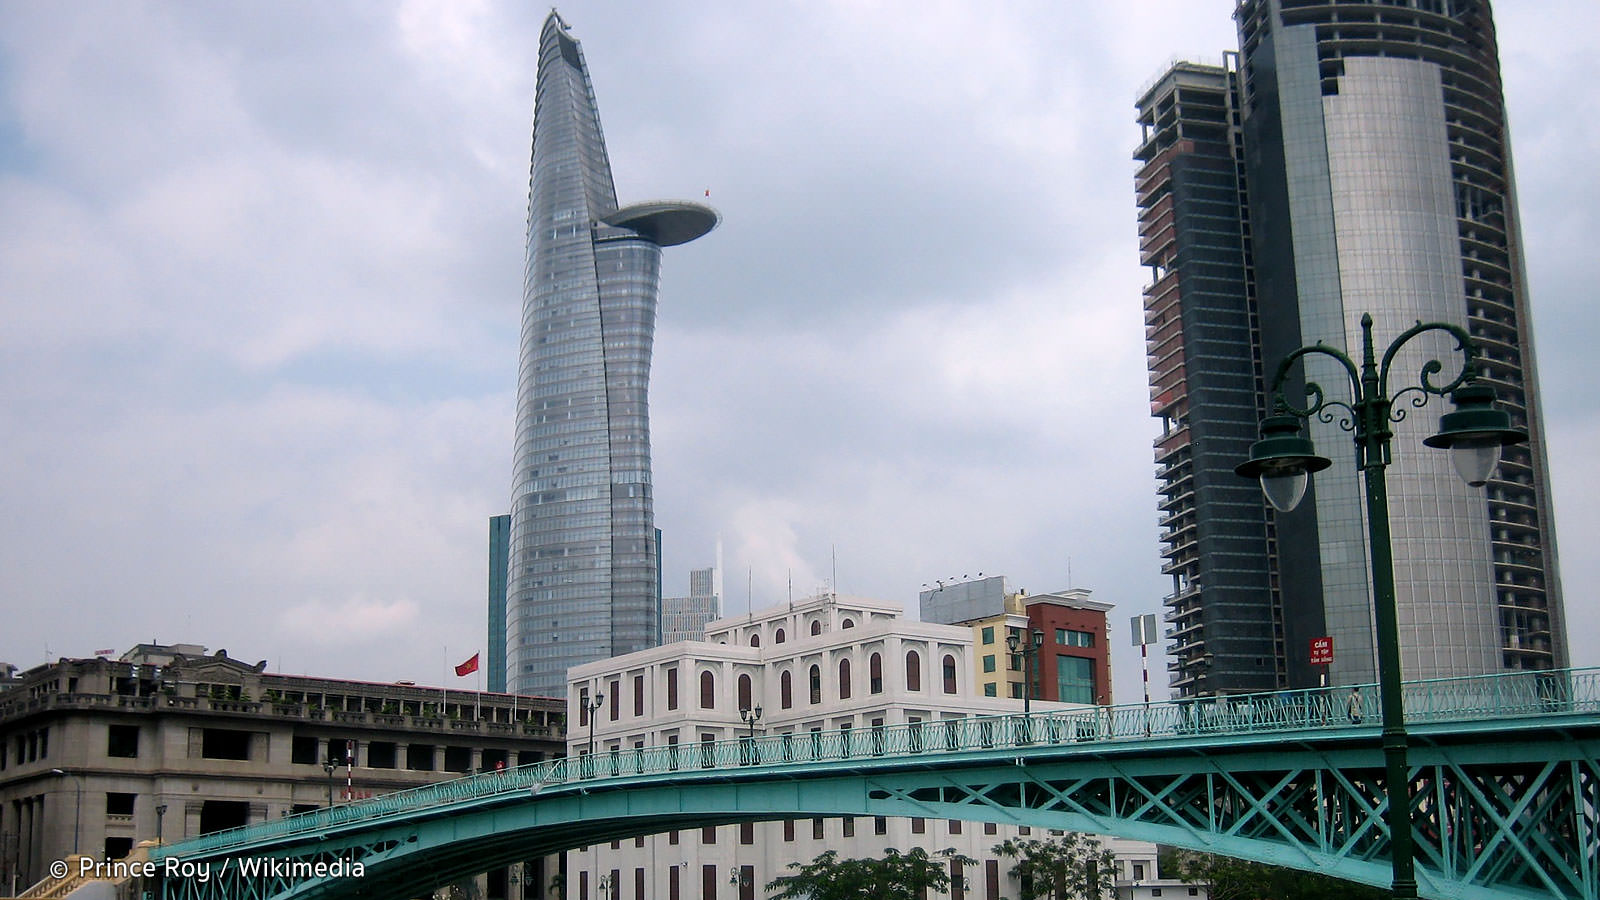 Top 5 Most Impressive Architectural Designs in Ho Chi Minh City